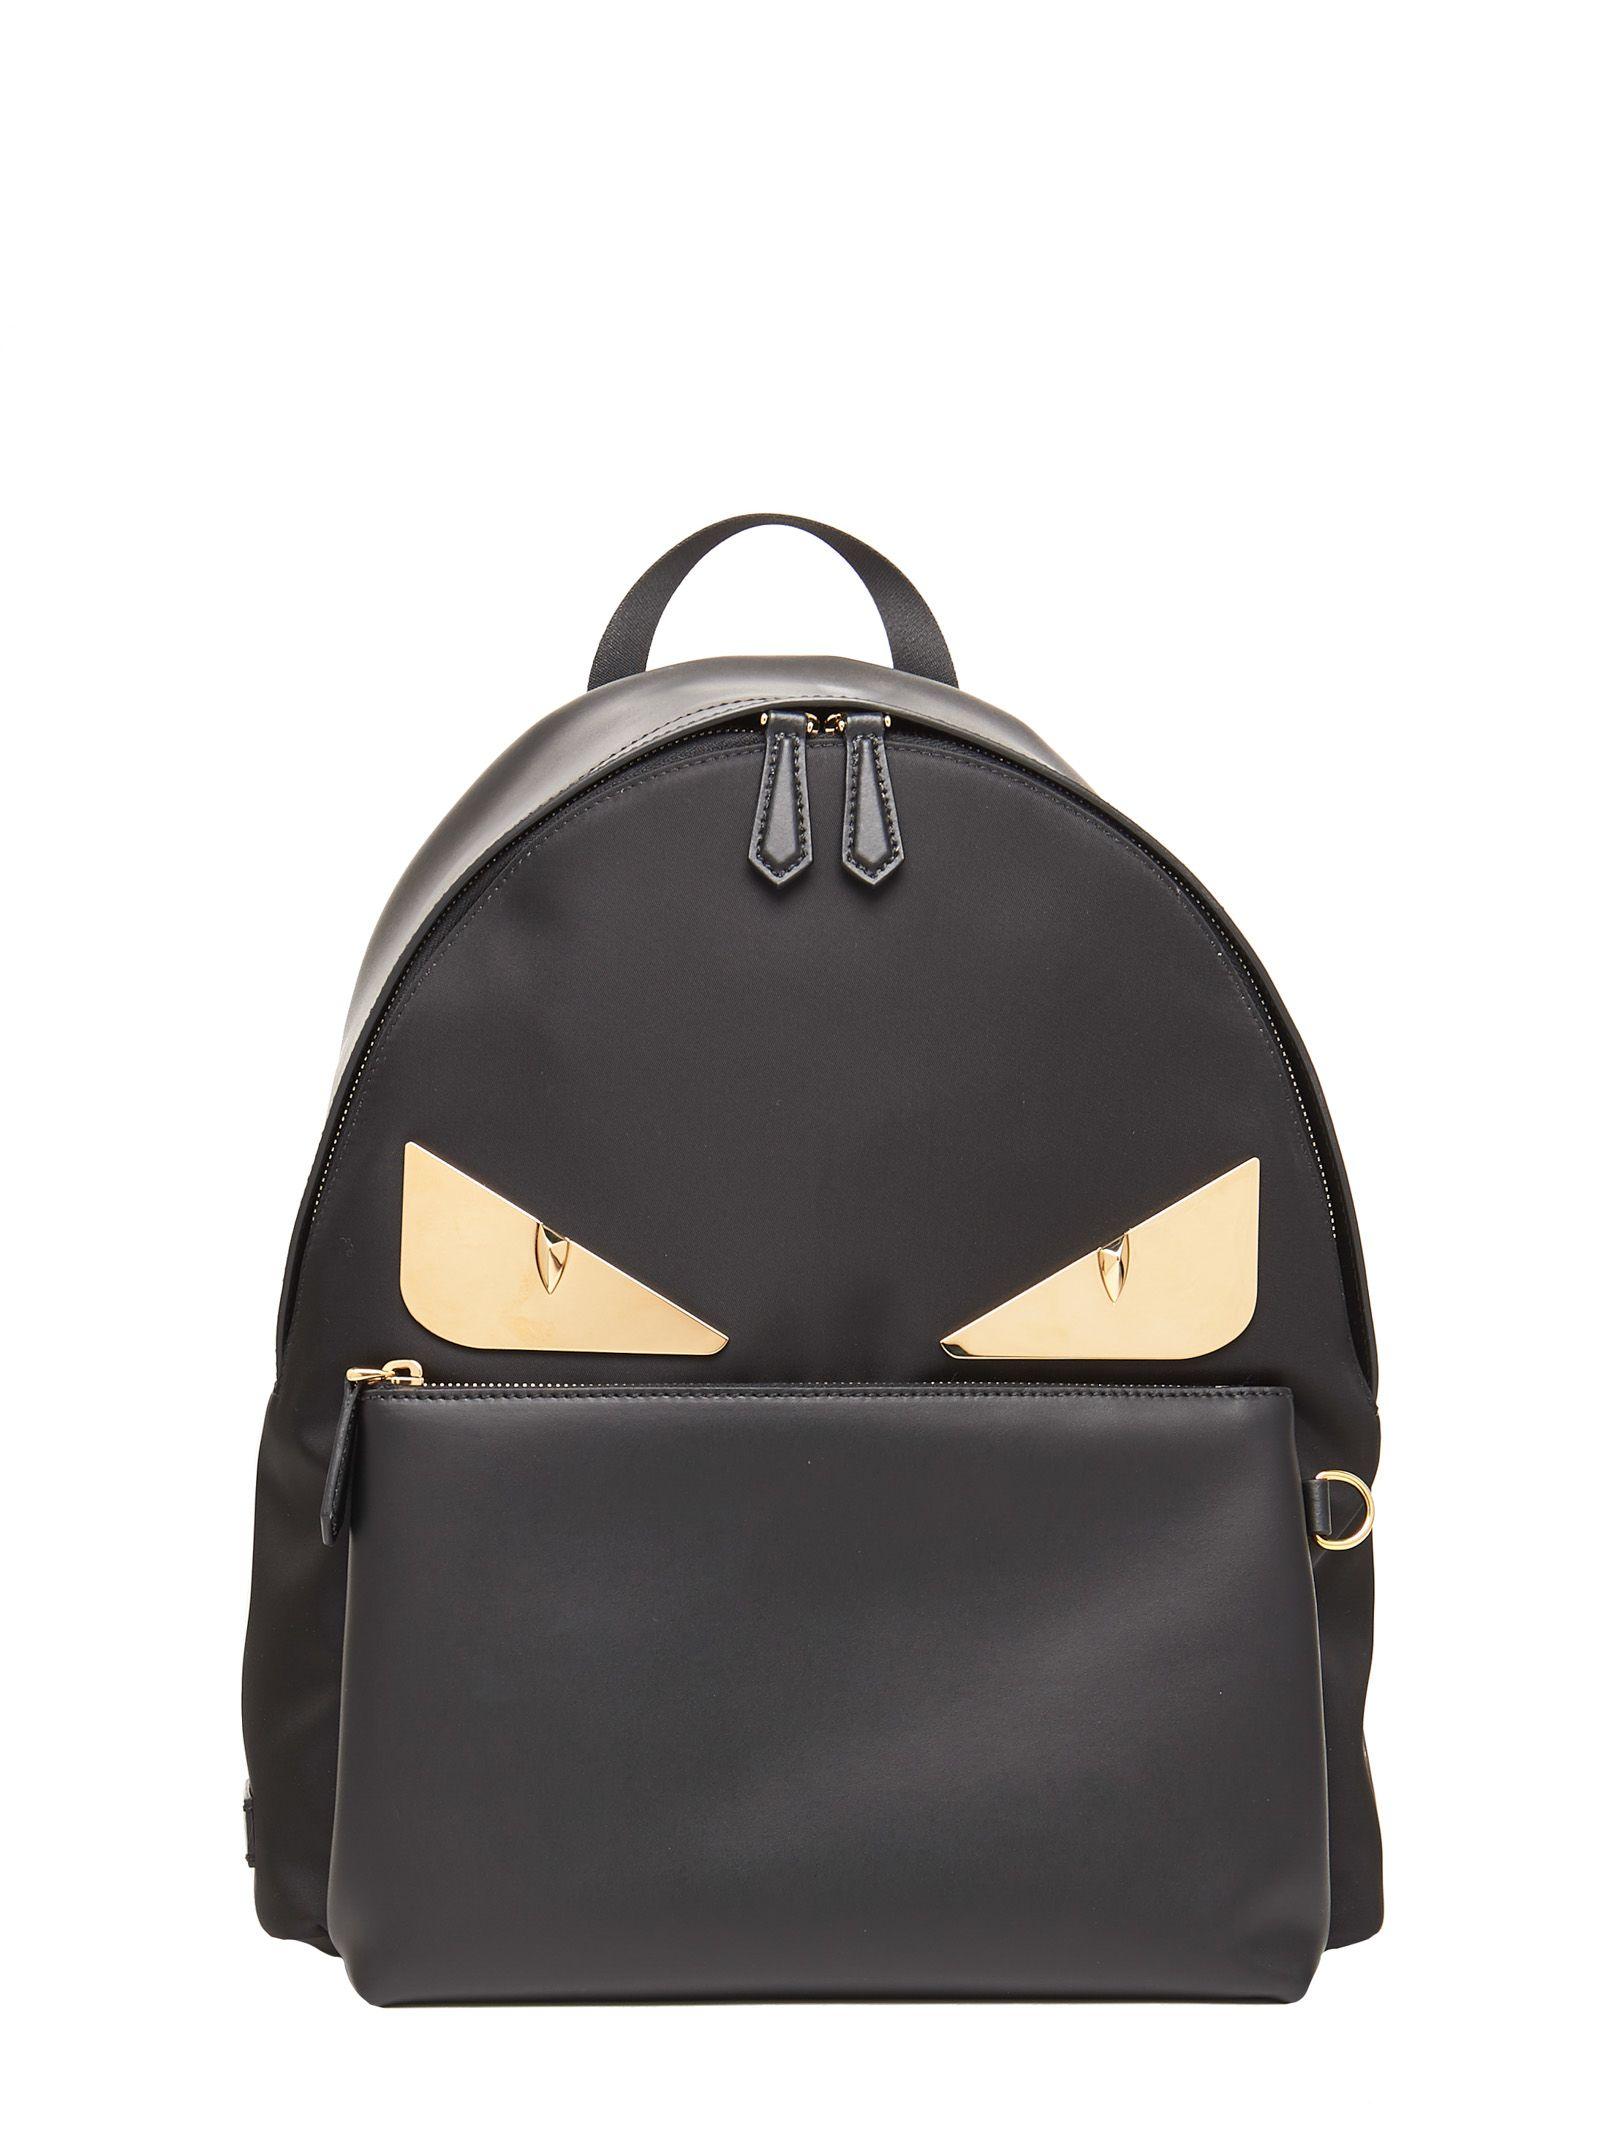 1eb101c1d112 FENDI BUGS BAG